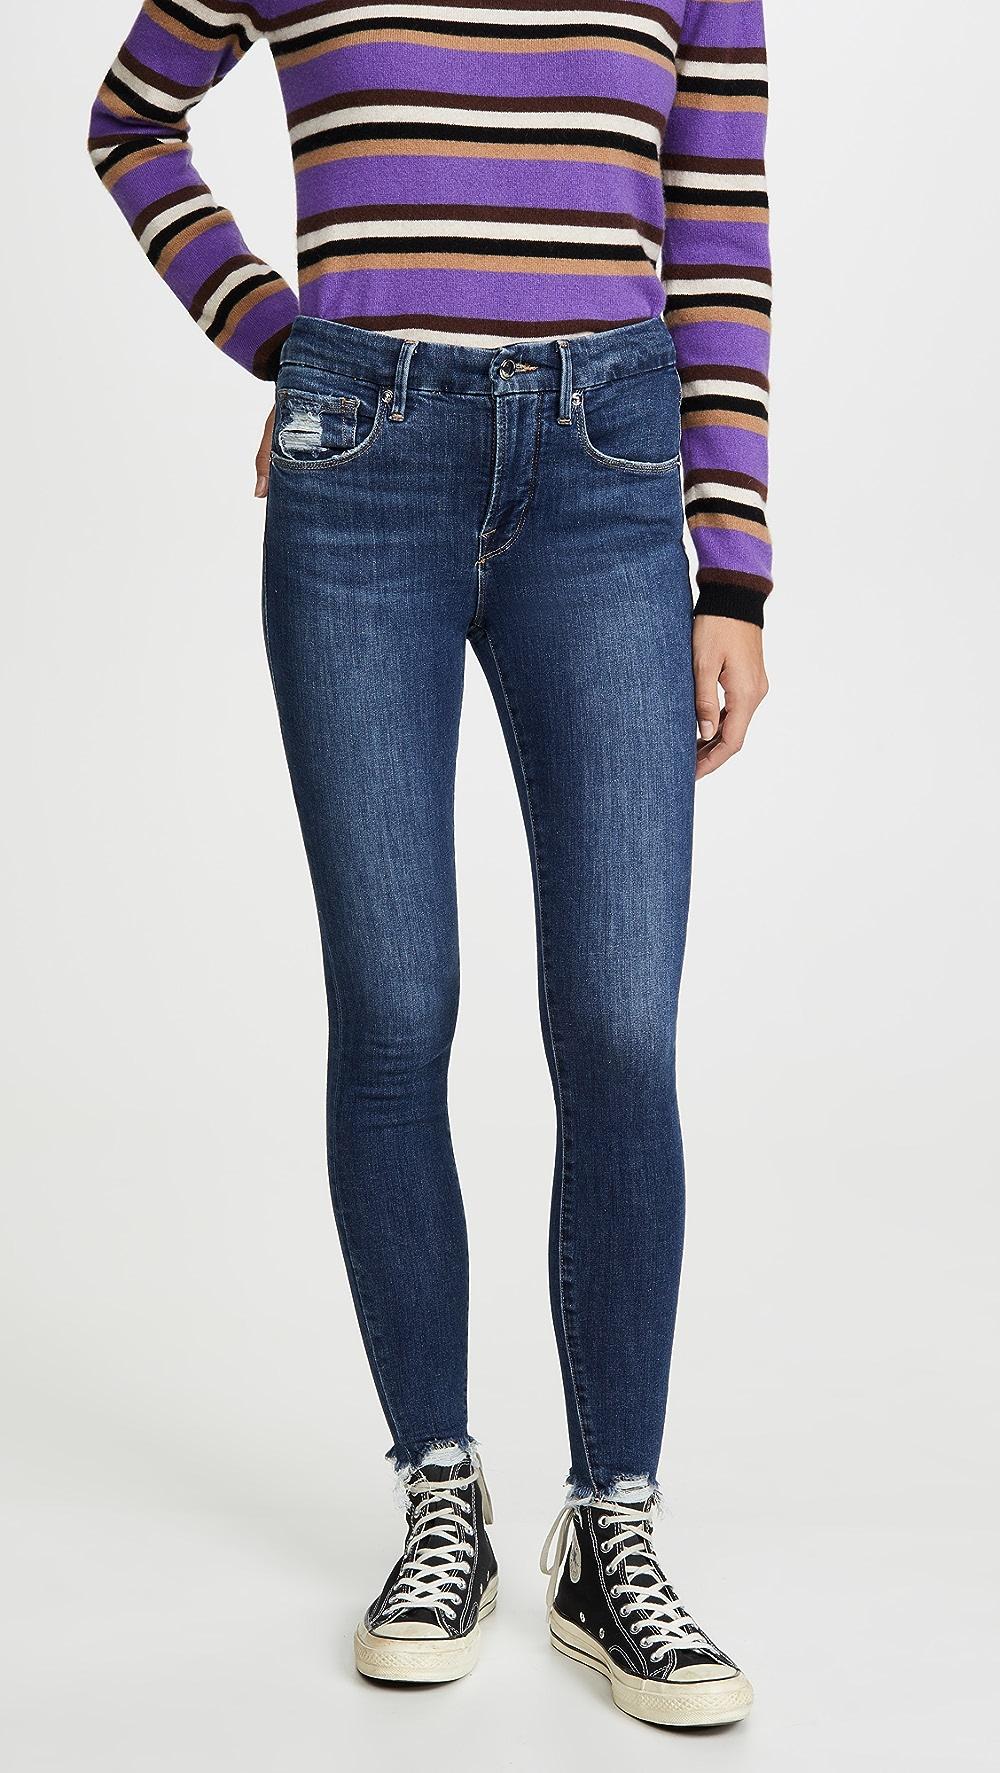 Aspiring Good American - Good Legs Extreme Stiletto Jeans Lustrous